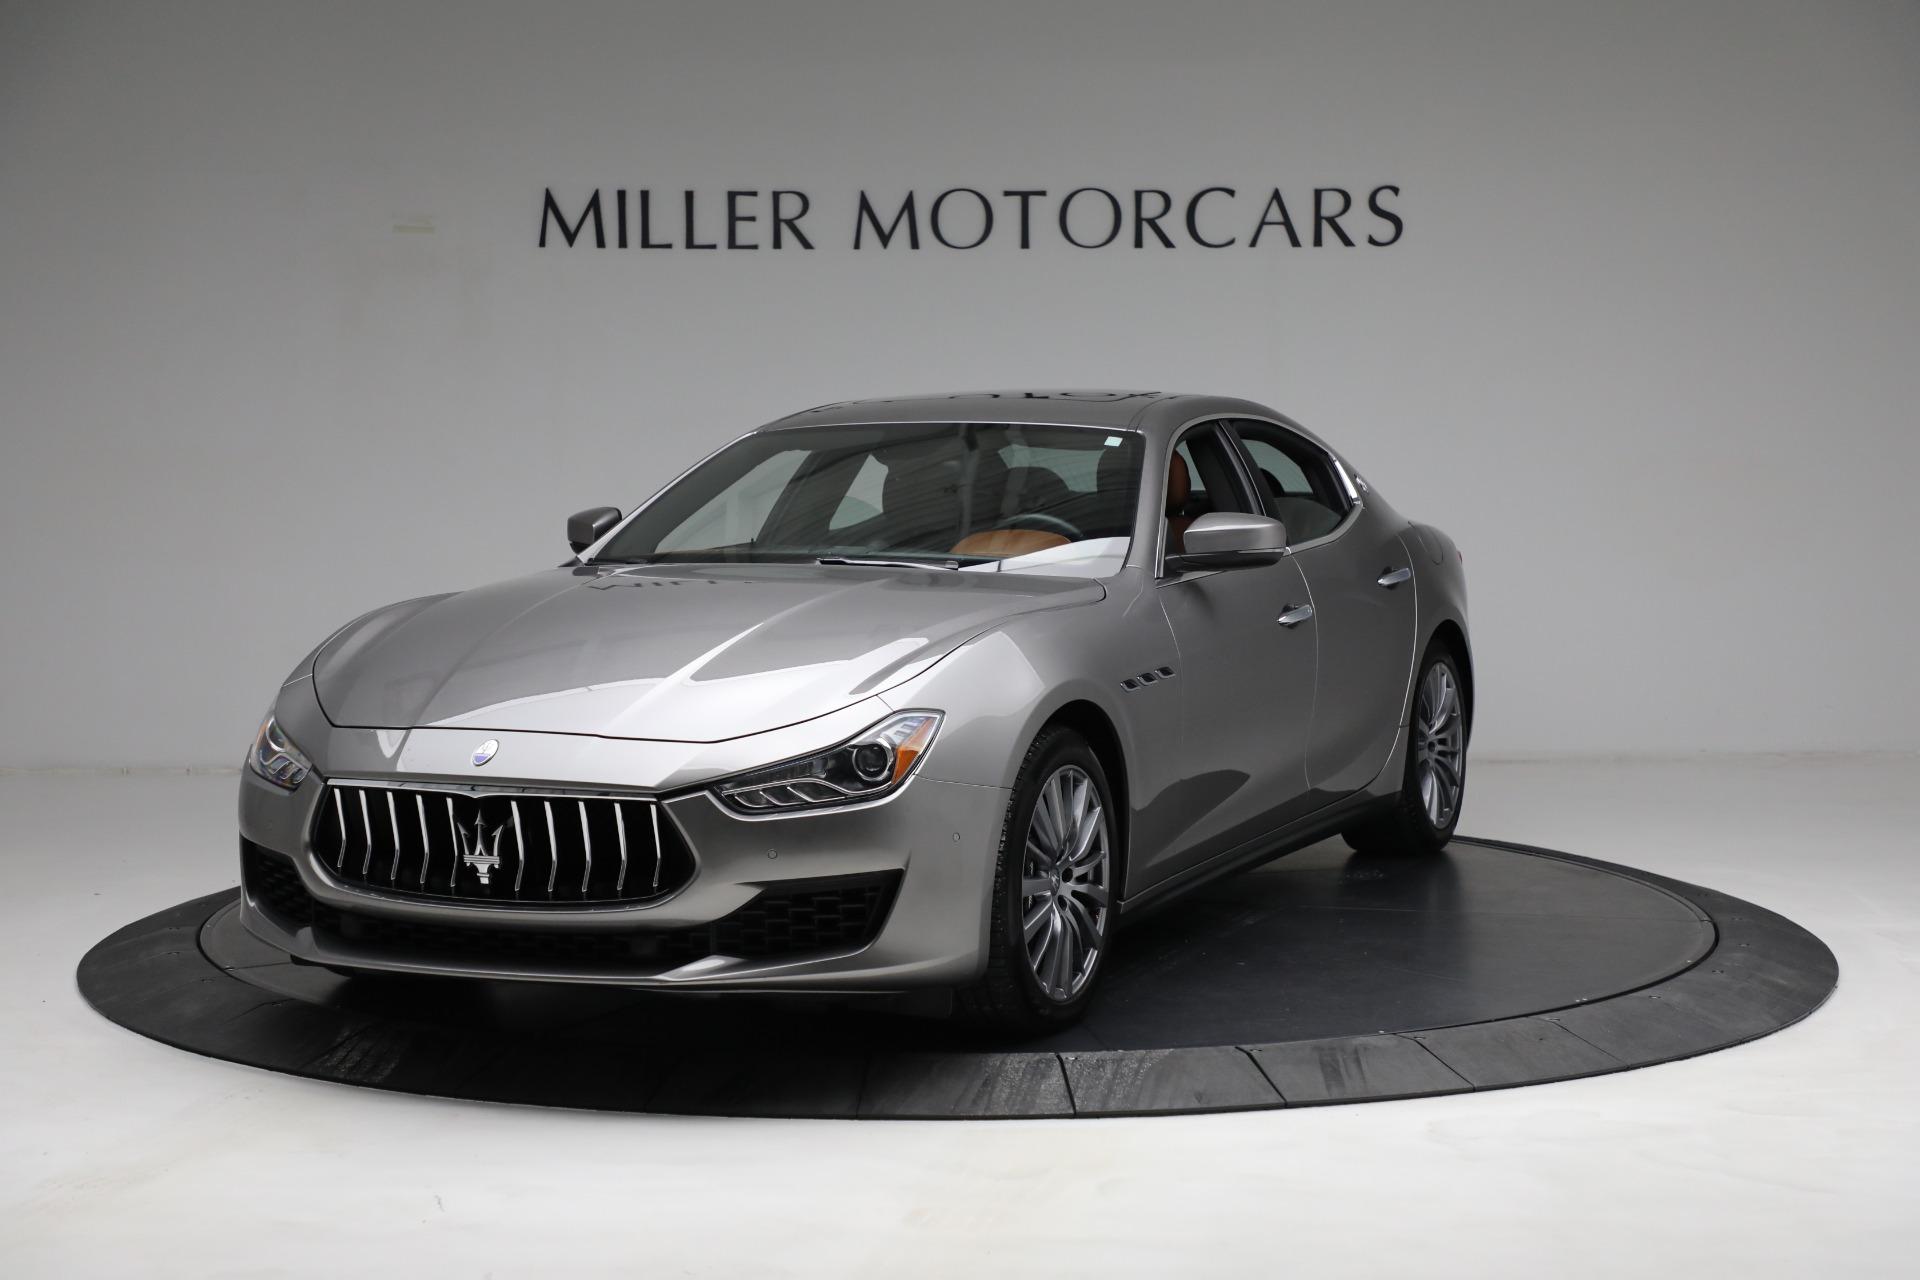 New 2018 Maserati Ghibli S Q4 for sale Sold at Maserati of Greenwich in Greenwich CT 06830 1